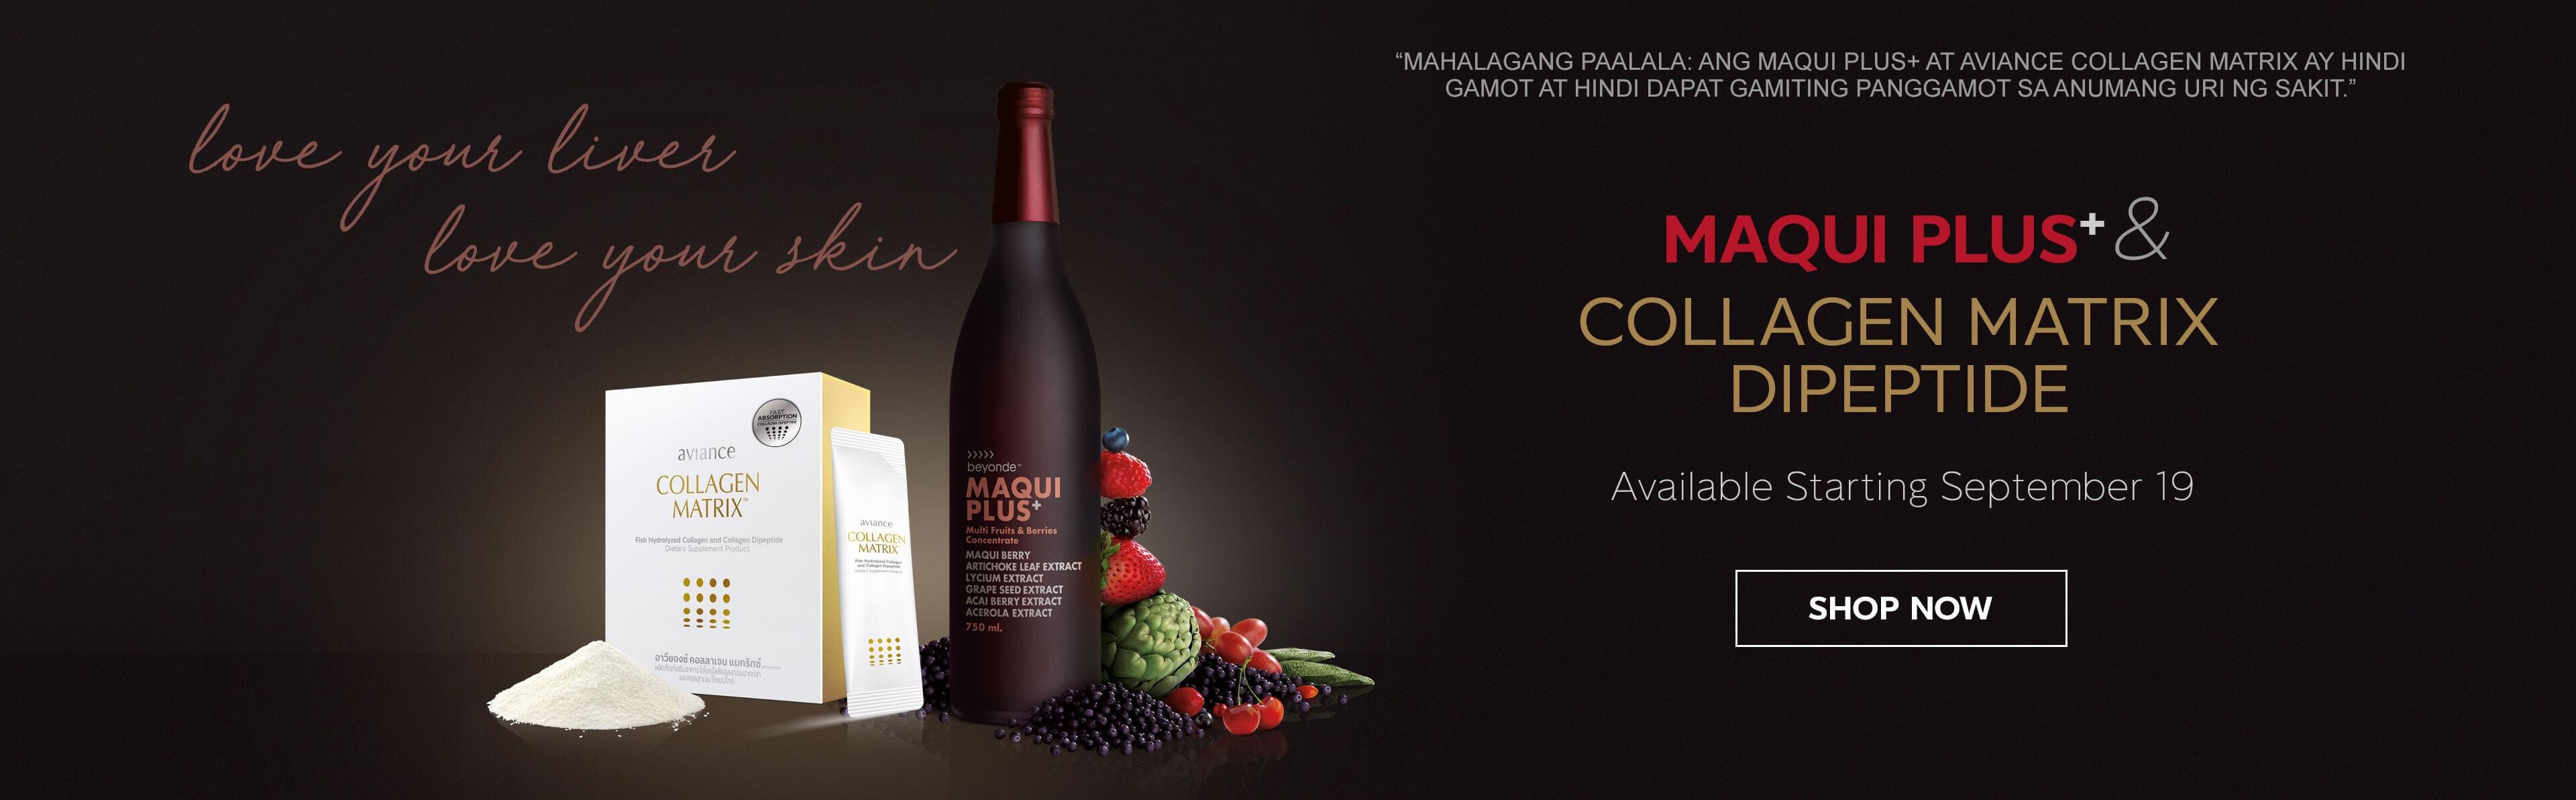 Welcome beyonde Maqui Plus+ & aviance Collagen Matrix